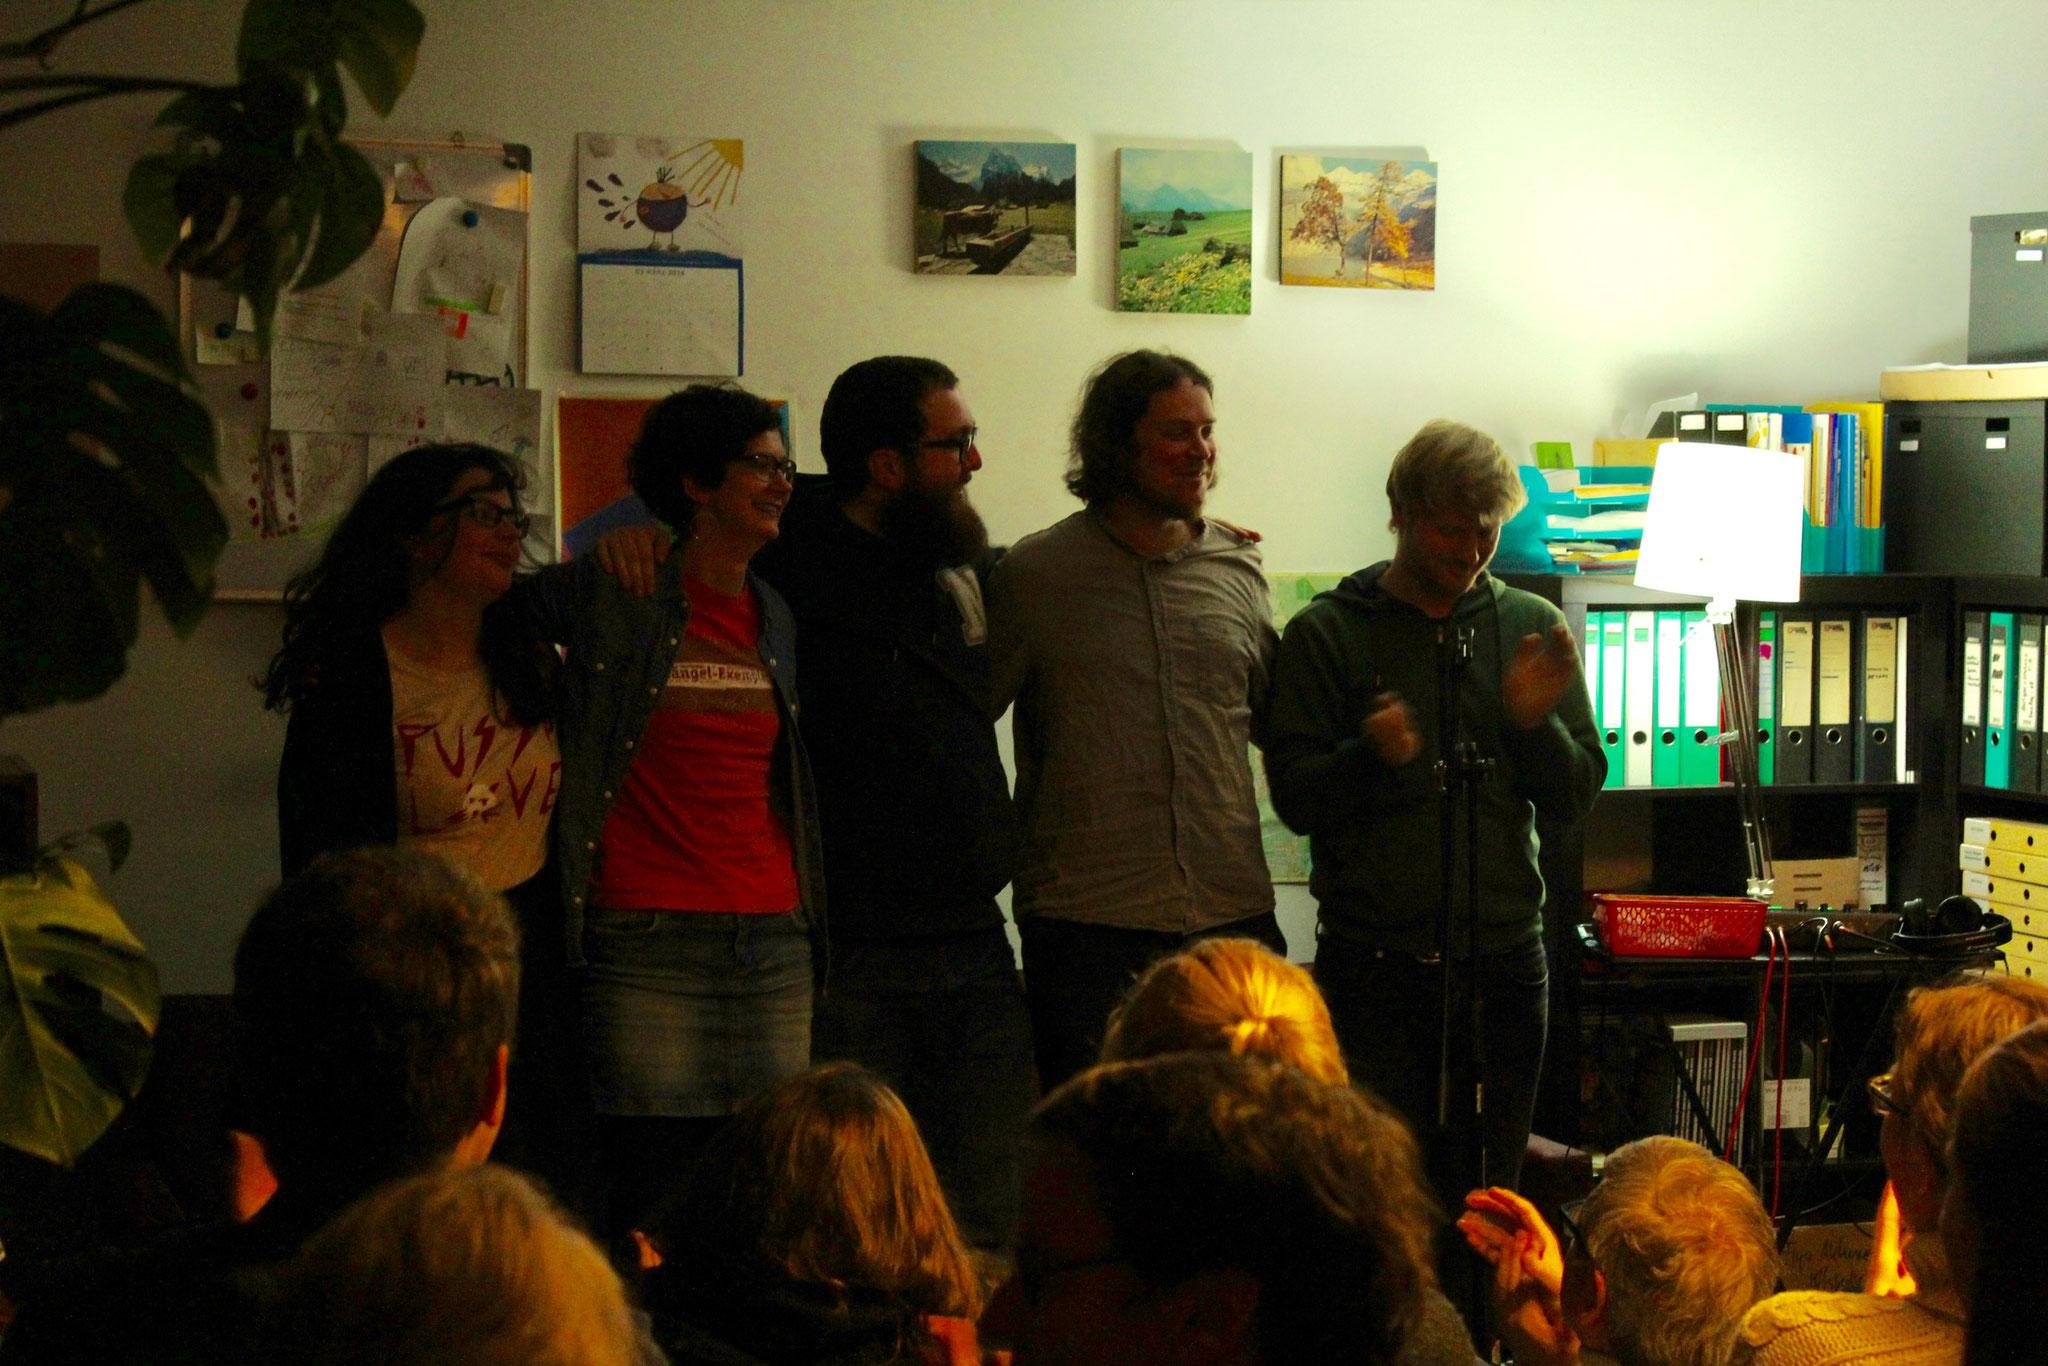 Schlussapplaus mit Musiker Phonetics aus Leipzig. Foto: Paul Köllner